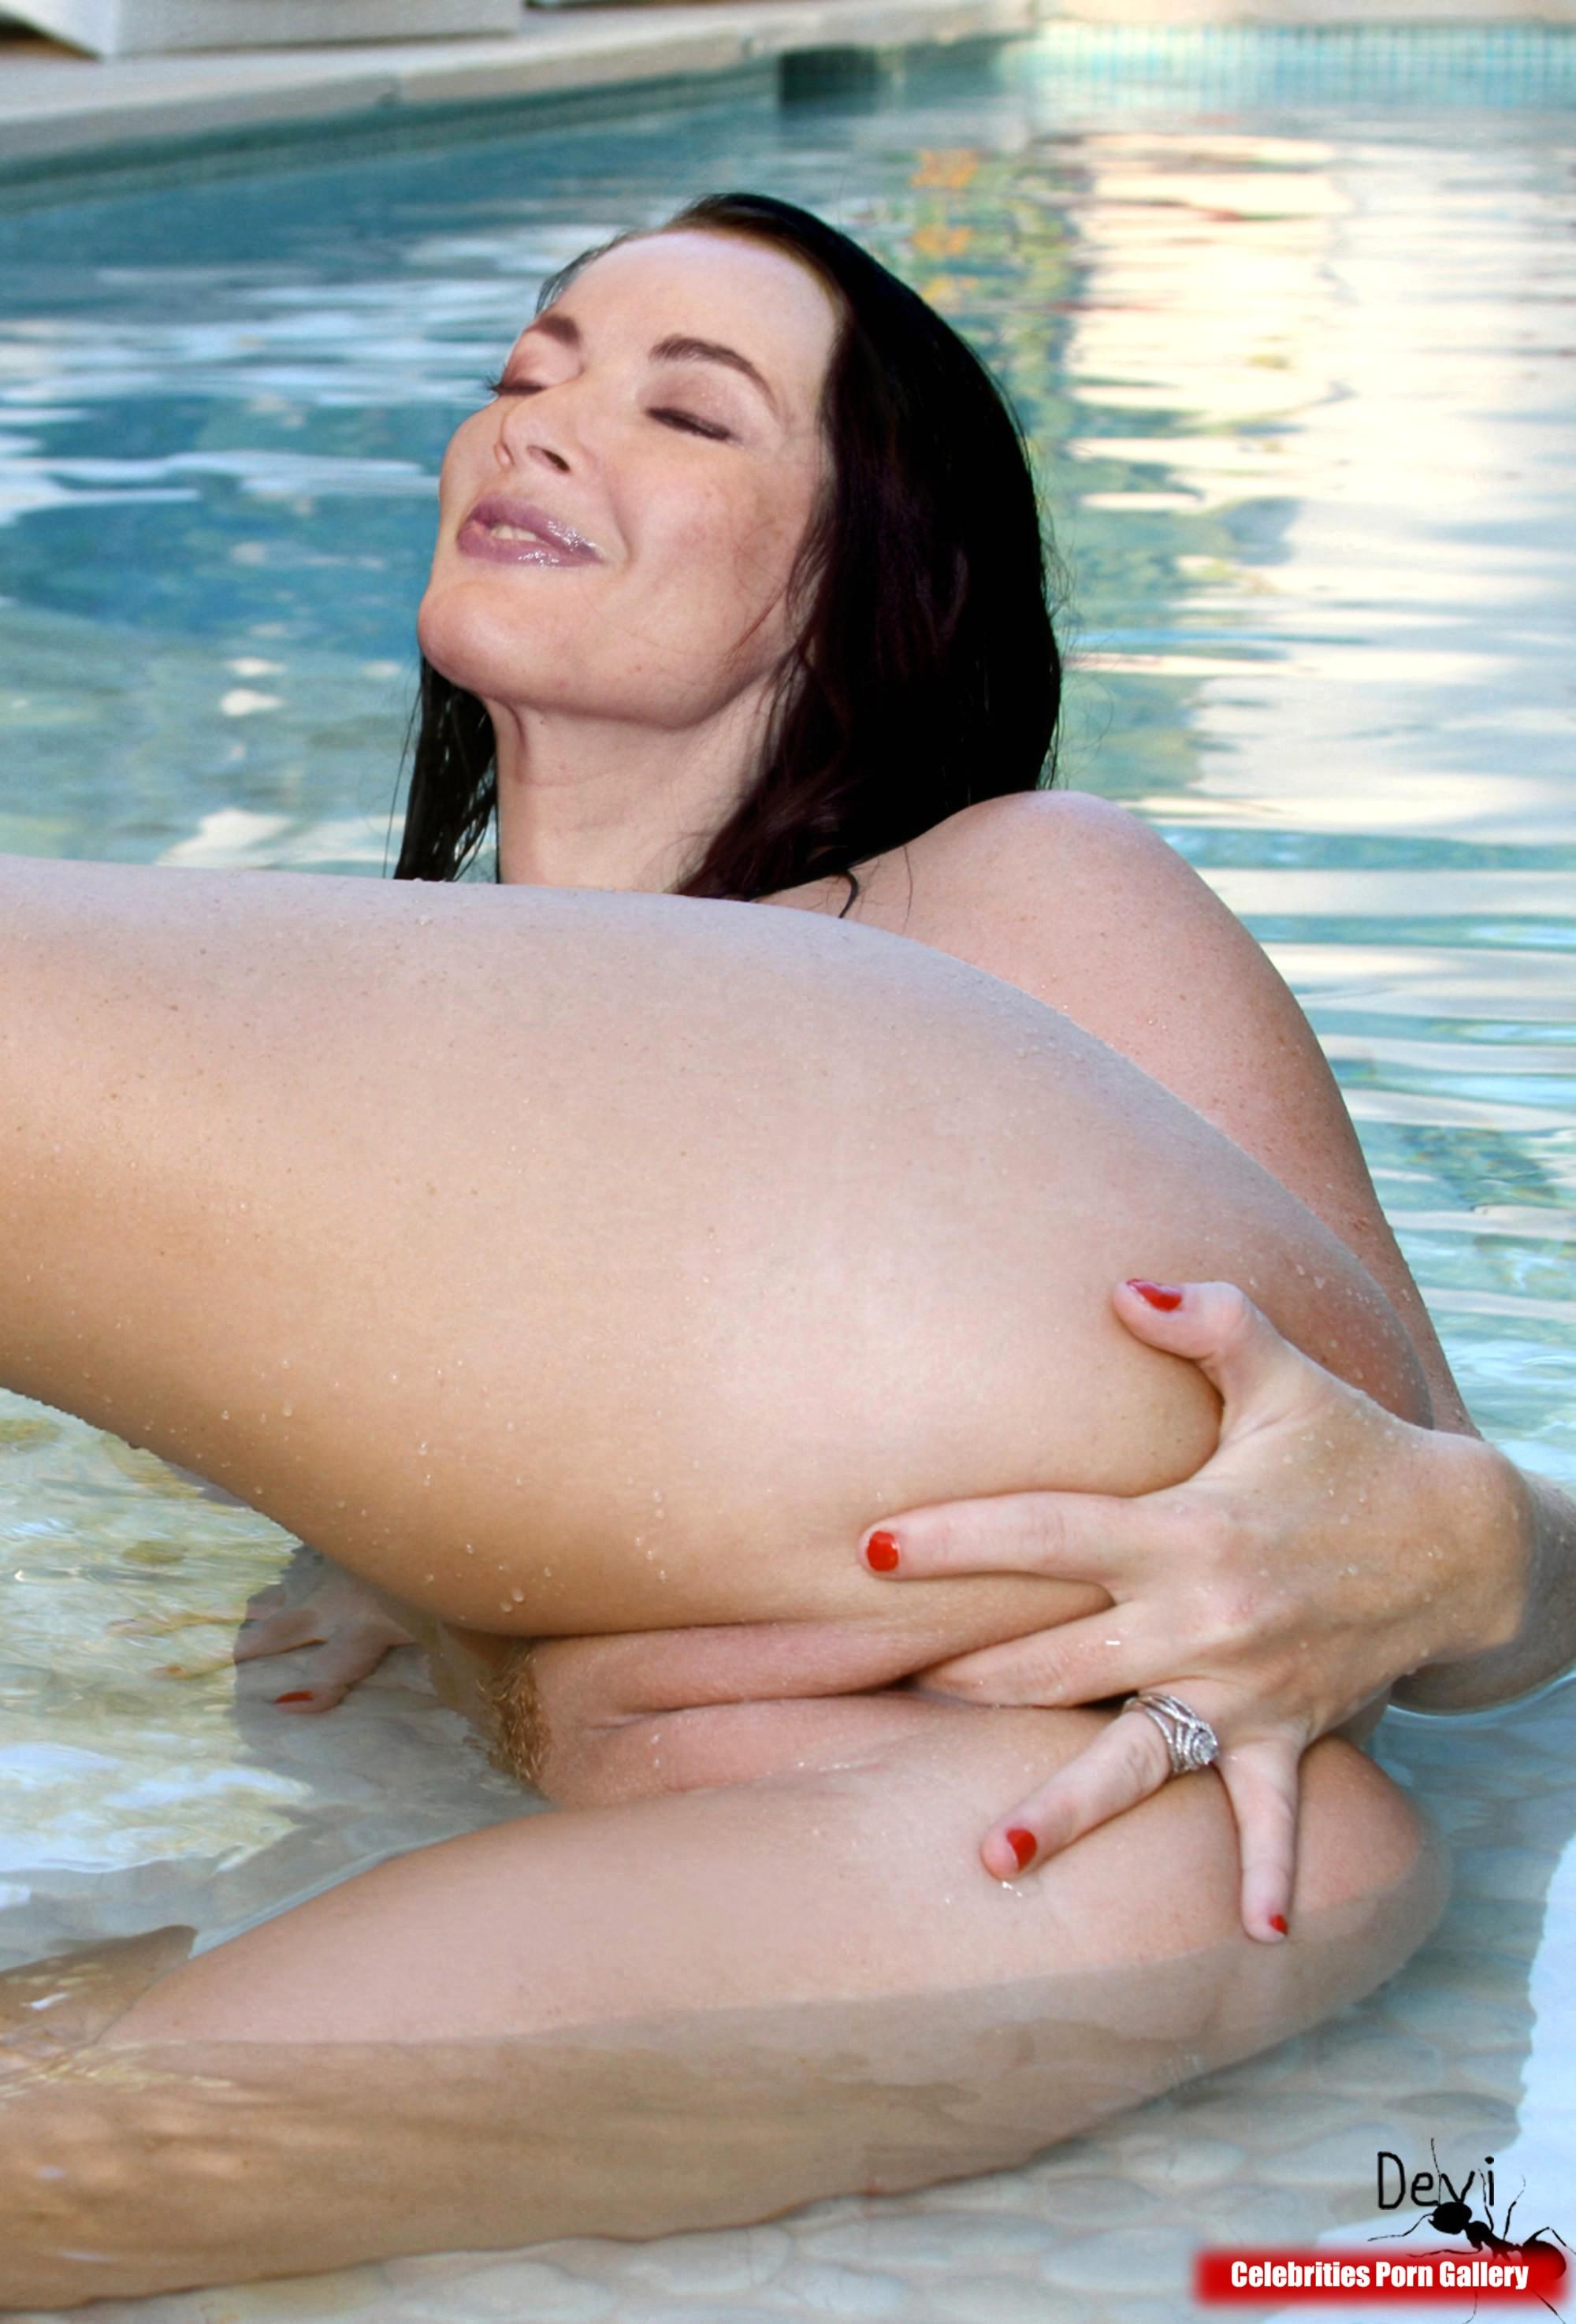 Nigella lawson nude